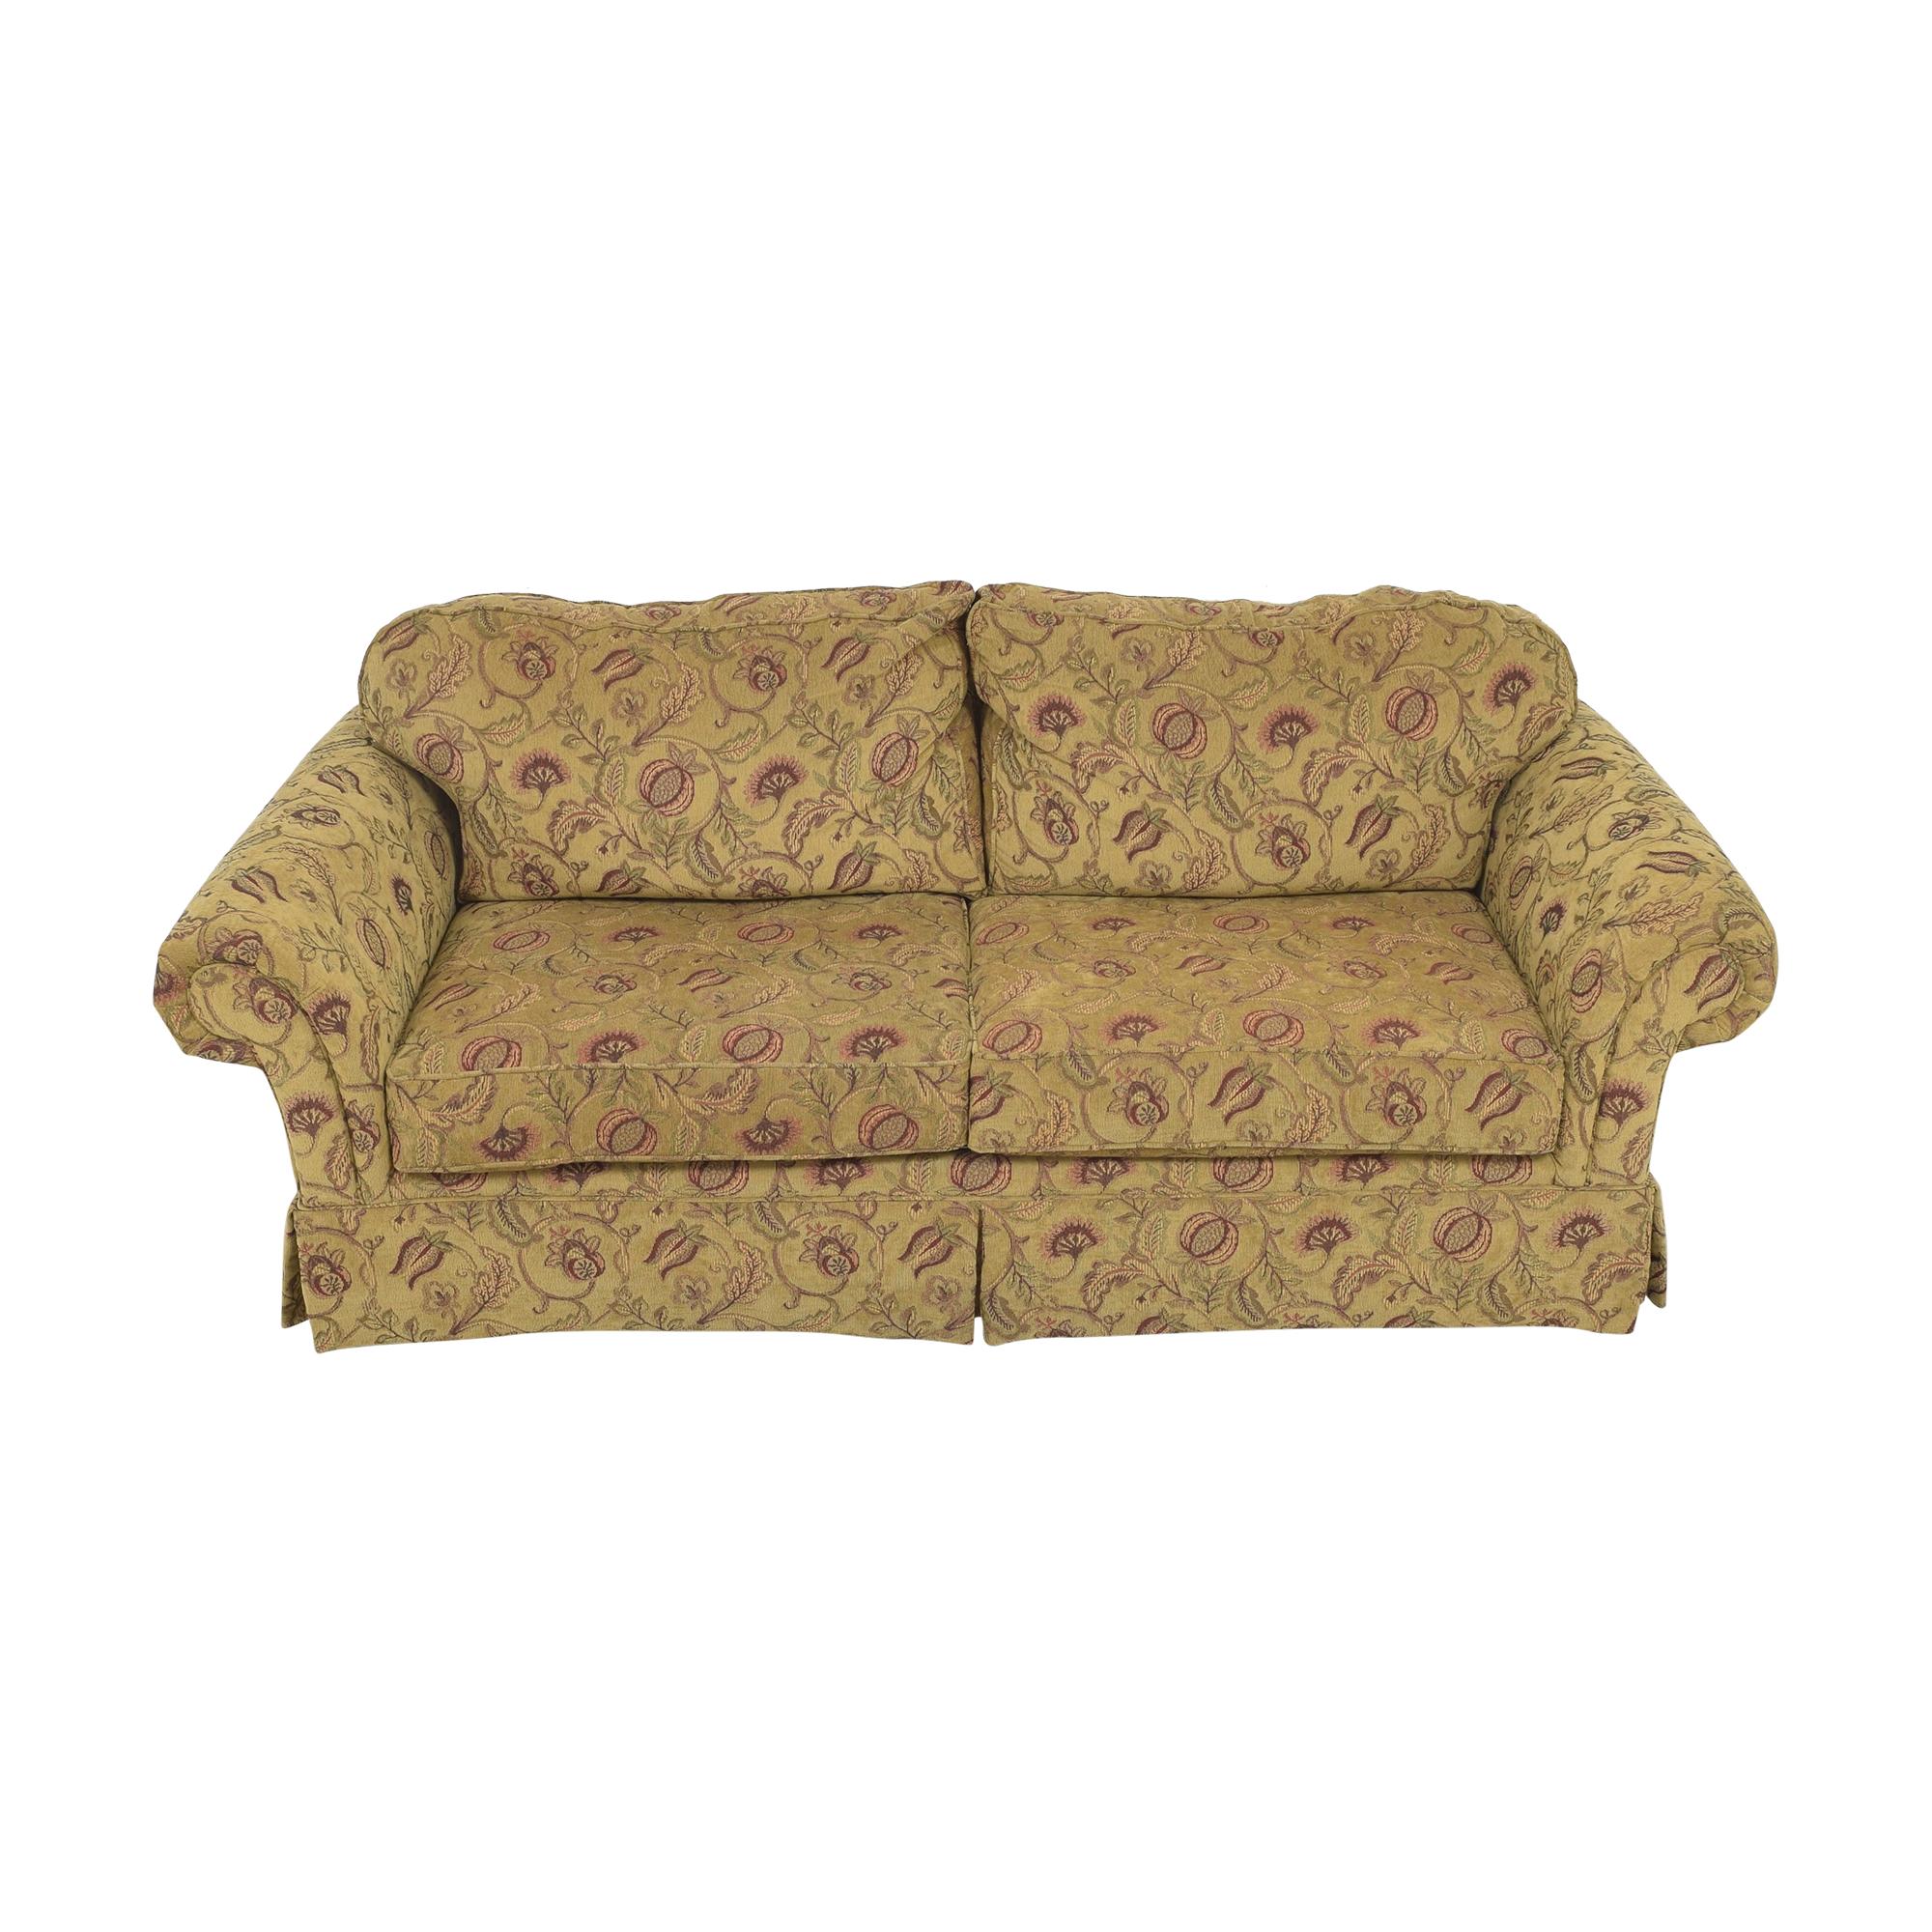 Broyhill Furniture Two Cushion Skirted Sofa sale